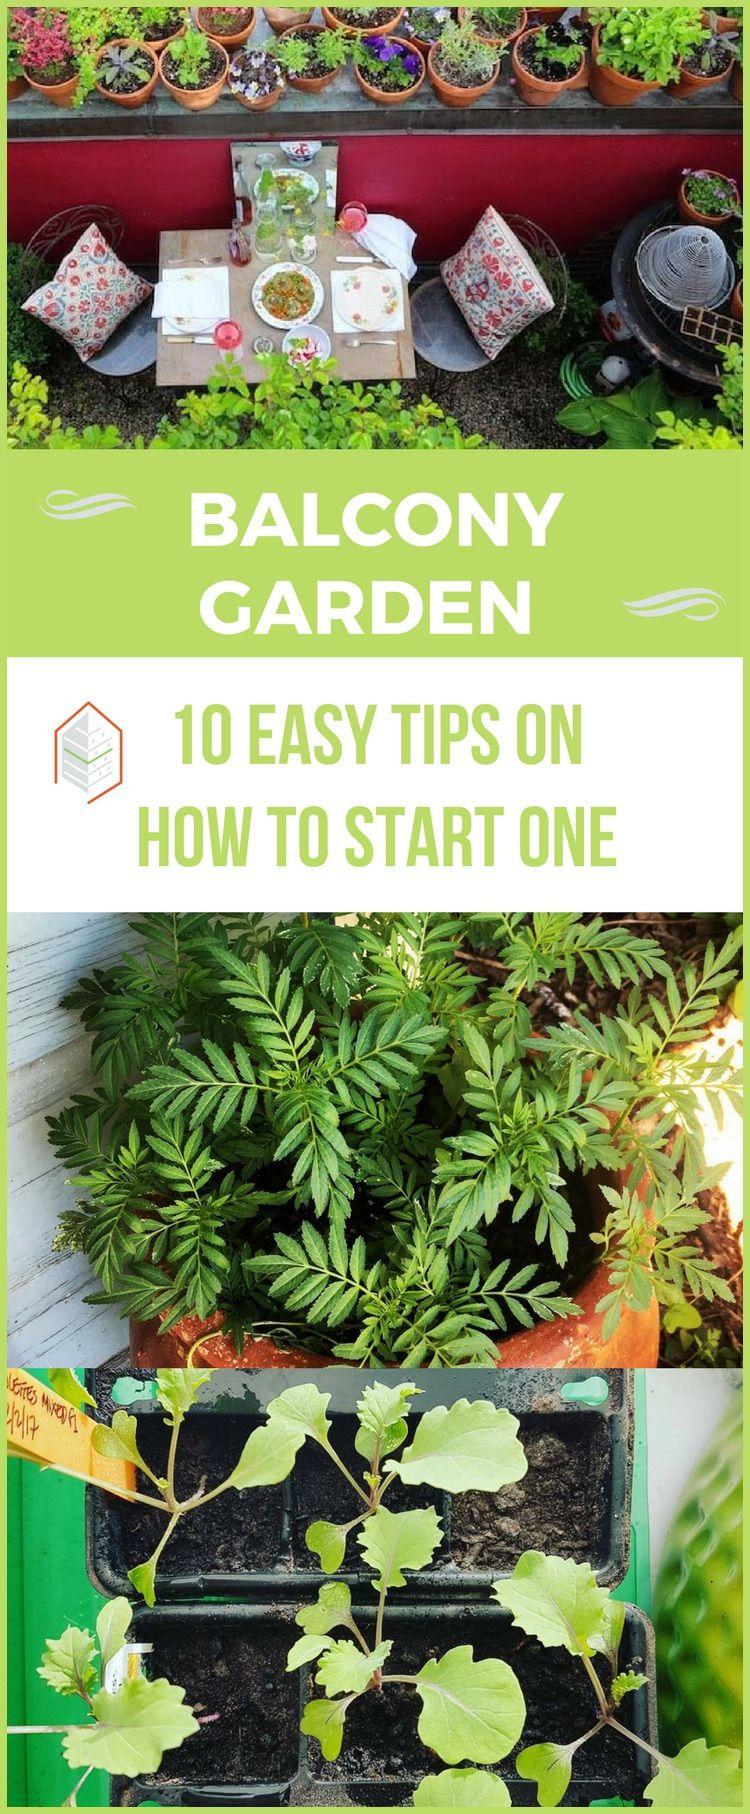 Photo of Balcony Garden: 10 Easy Tips on How to Start One